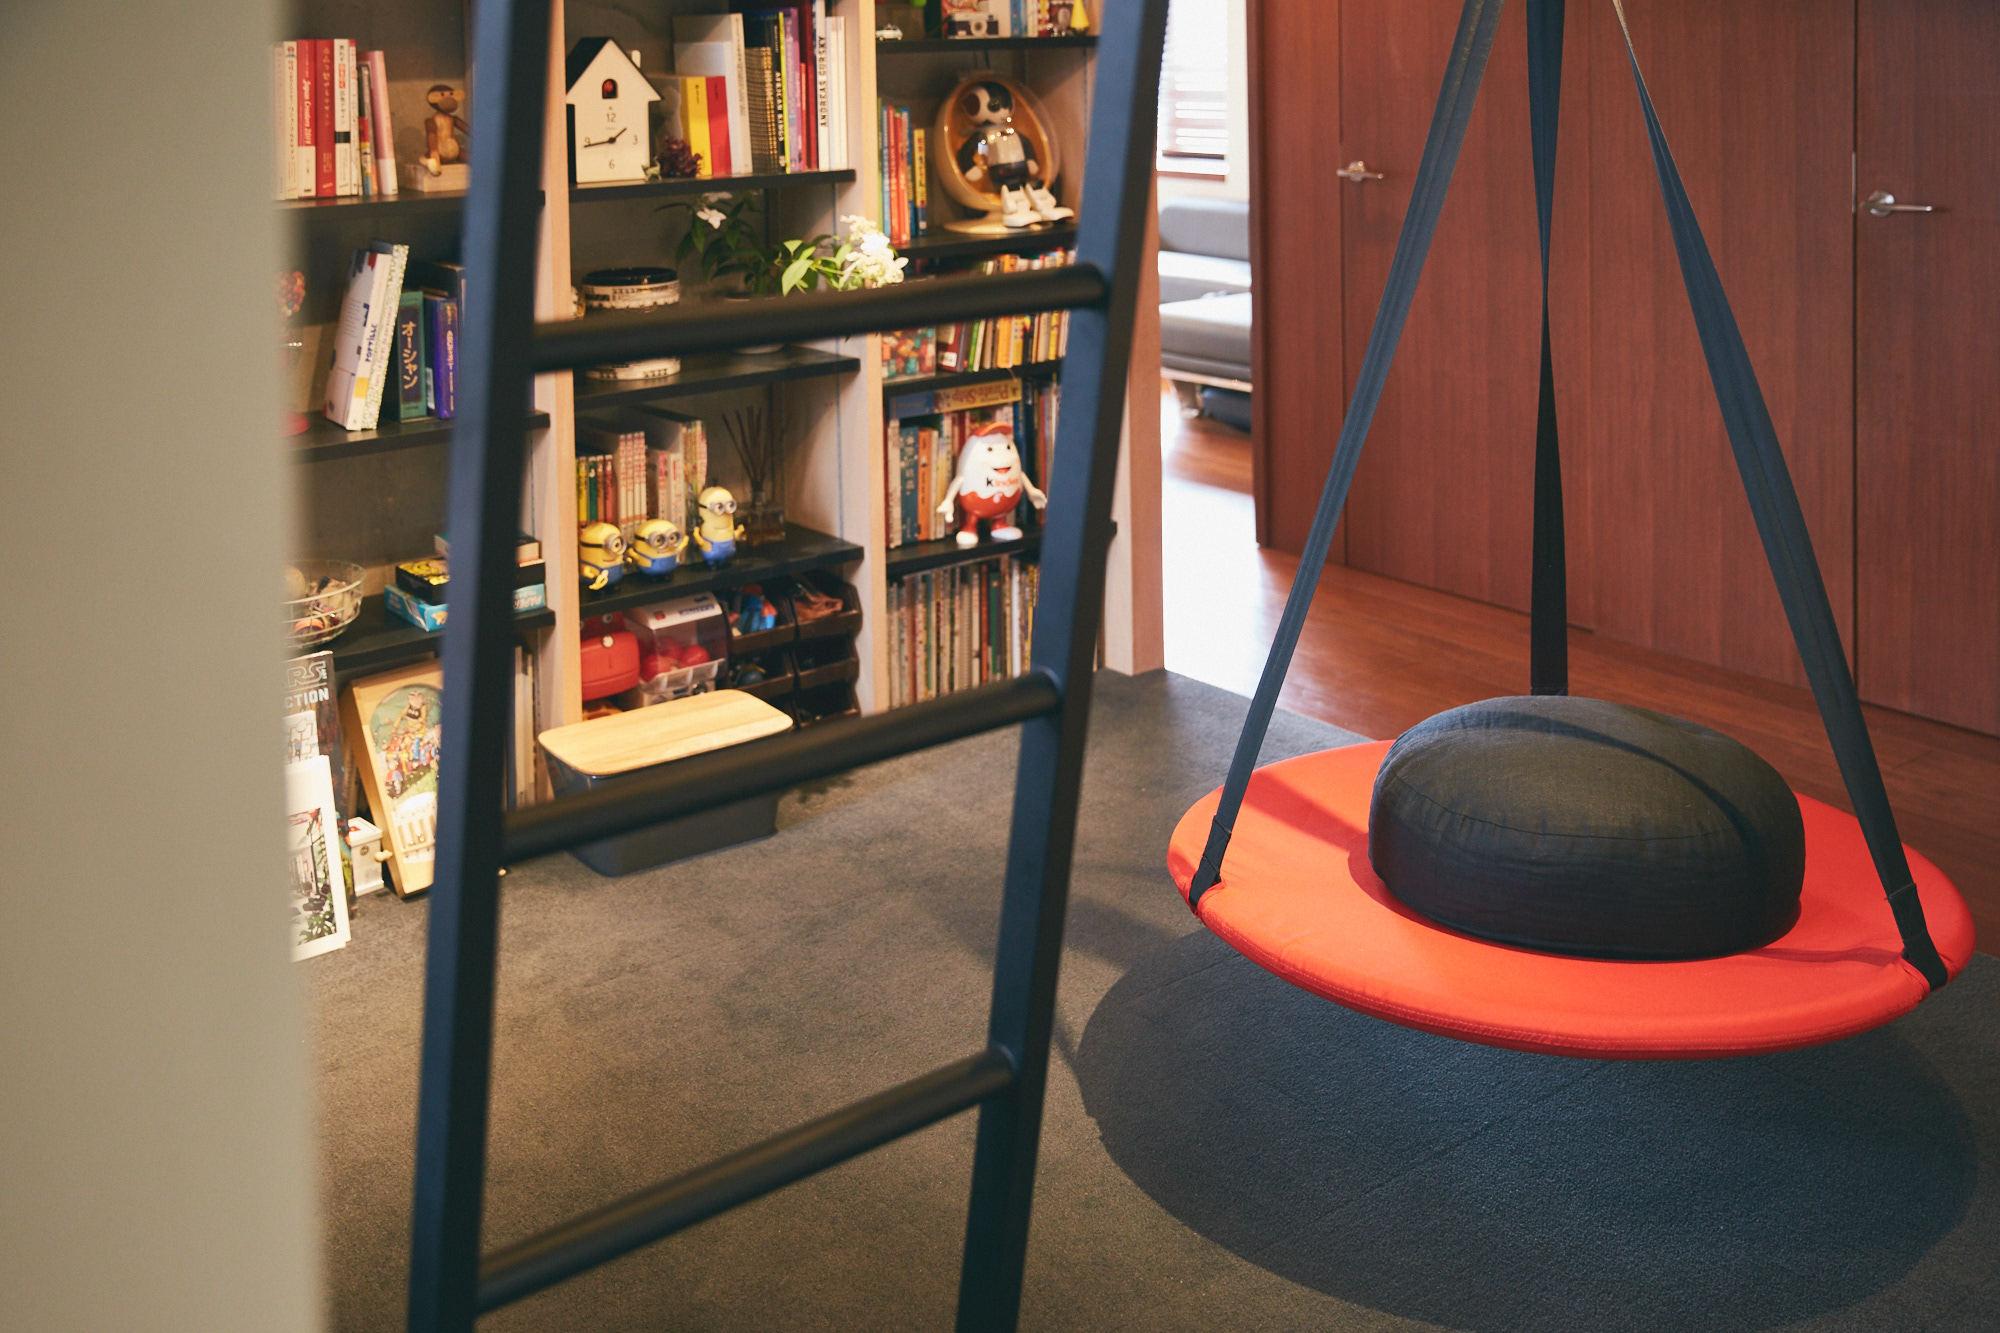 IKEAのブランコがぶら下がる子供スペース